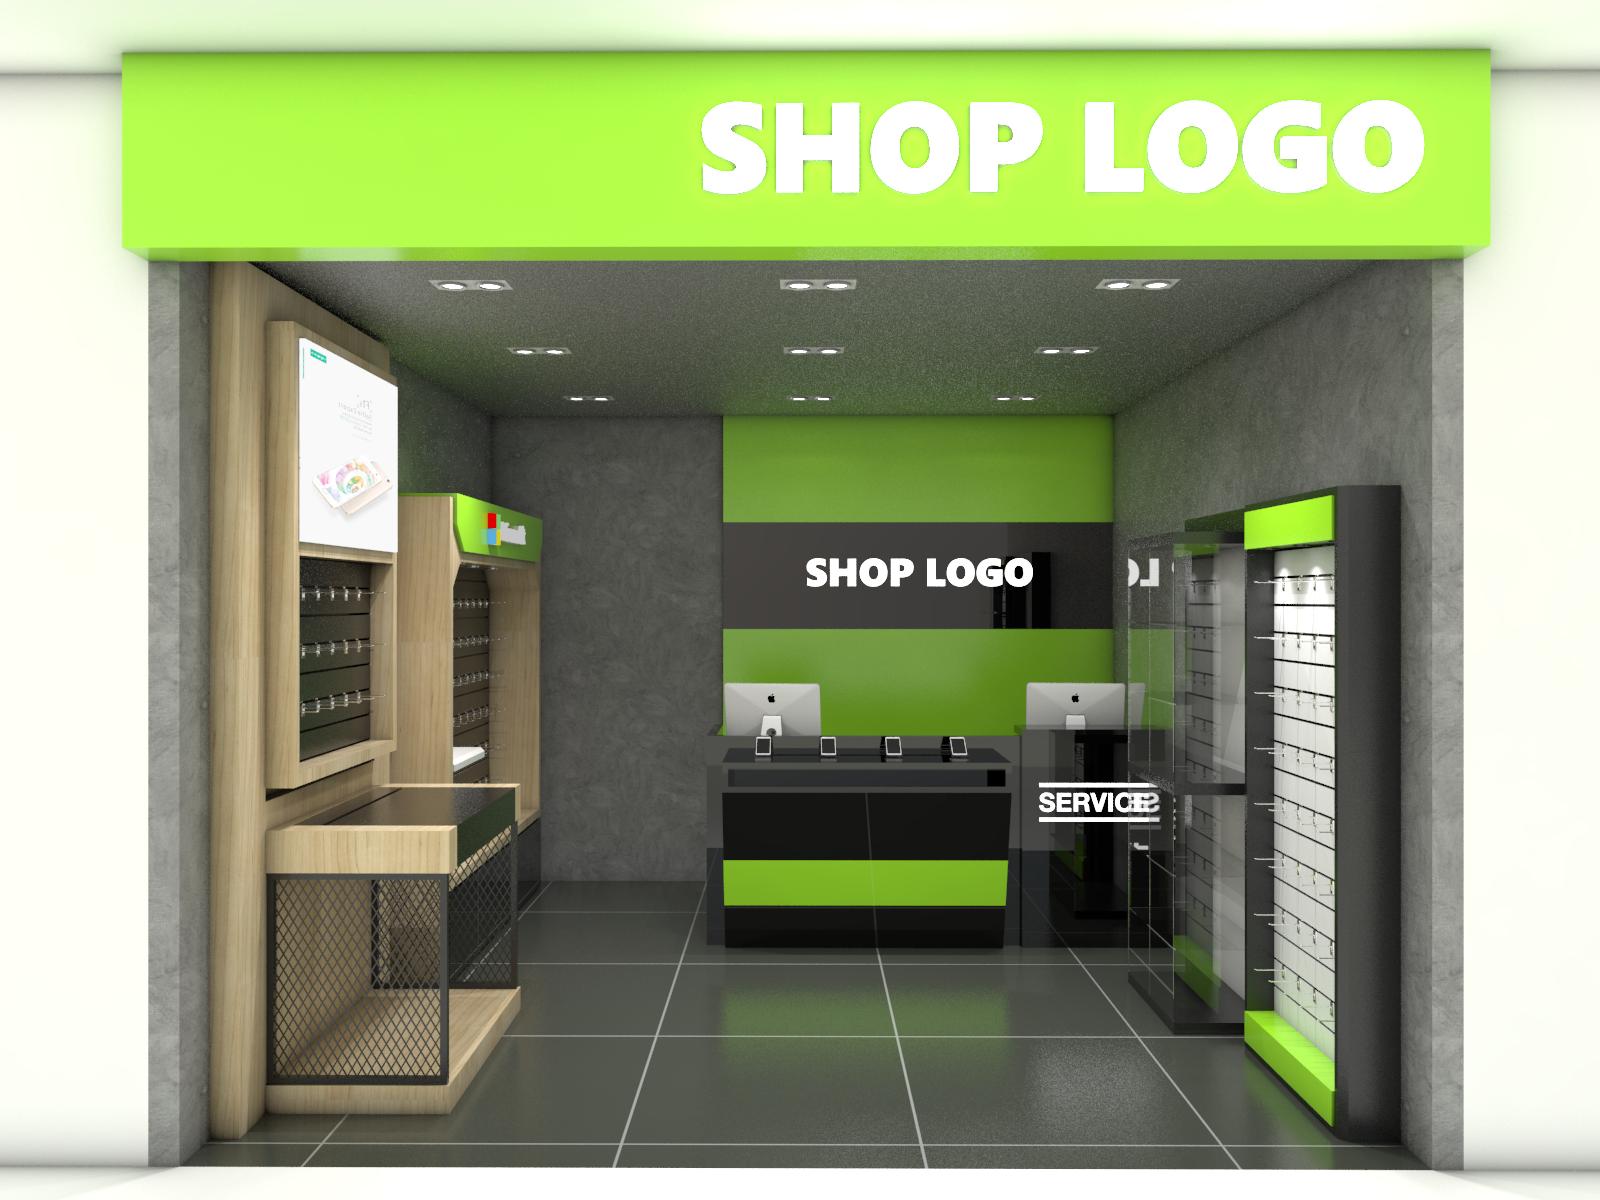 Shop set design 1(copy)(copy)(copy)(copy)(copy)(copy)(copy)(copy)(copy)(copy)(copy)(copy)(copy)(copy)(copy)